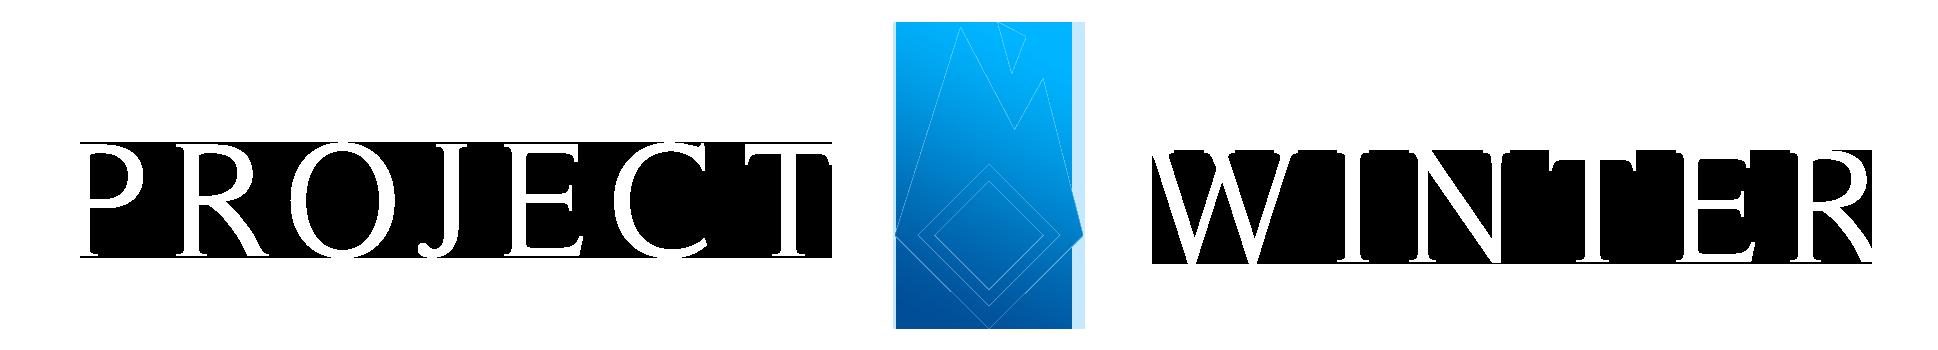 Логотип - Project Winter